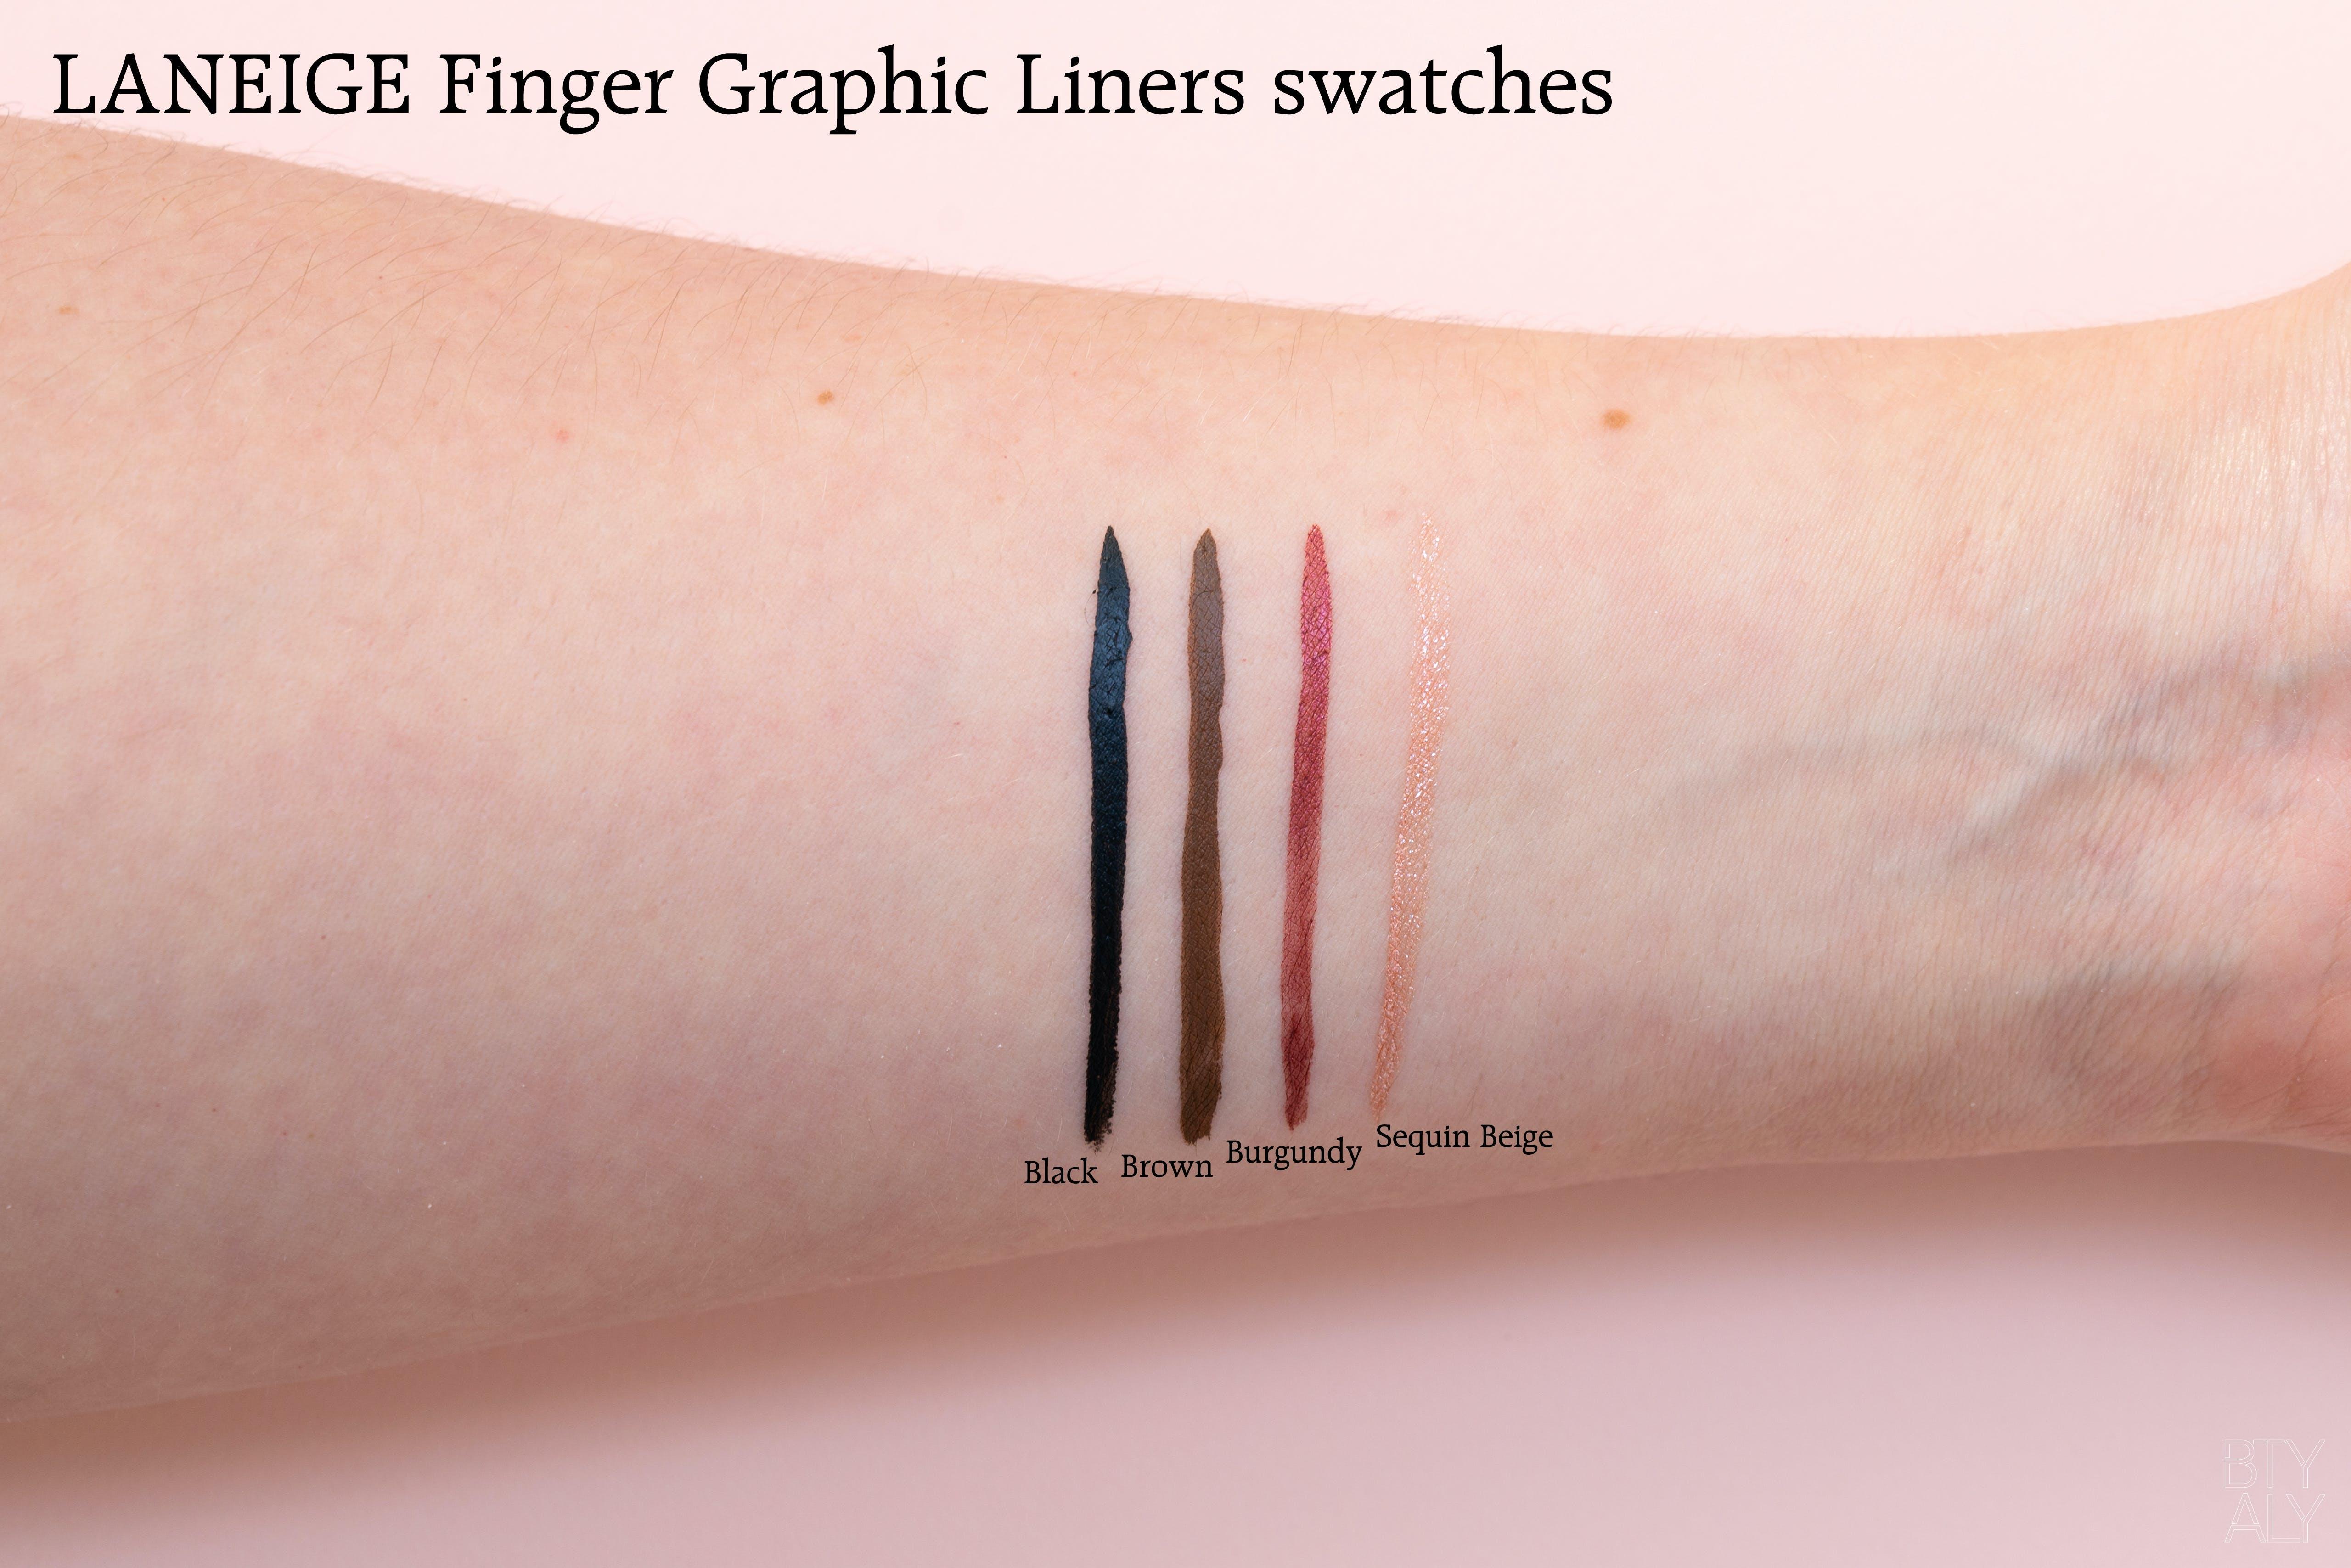 LANEIGE Finger Graphic Liner Black, Brown, Burgundy, Sequin Beige swatches